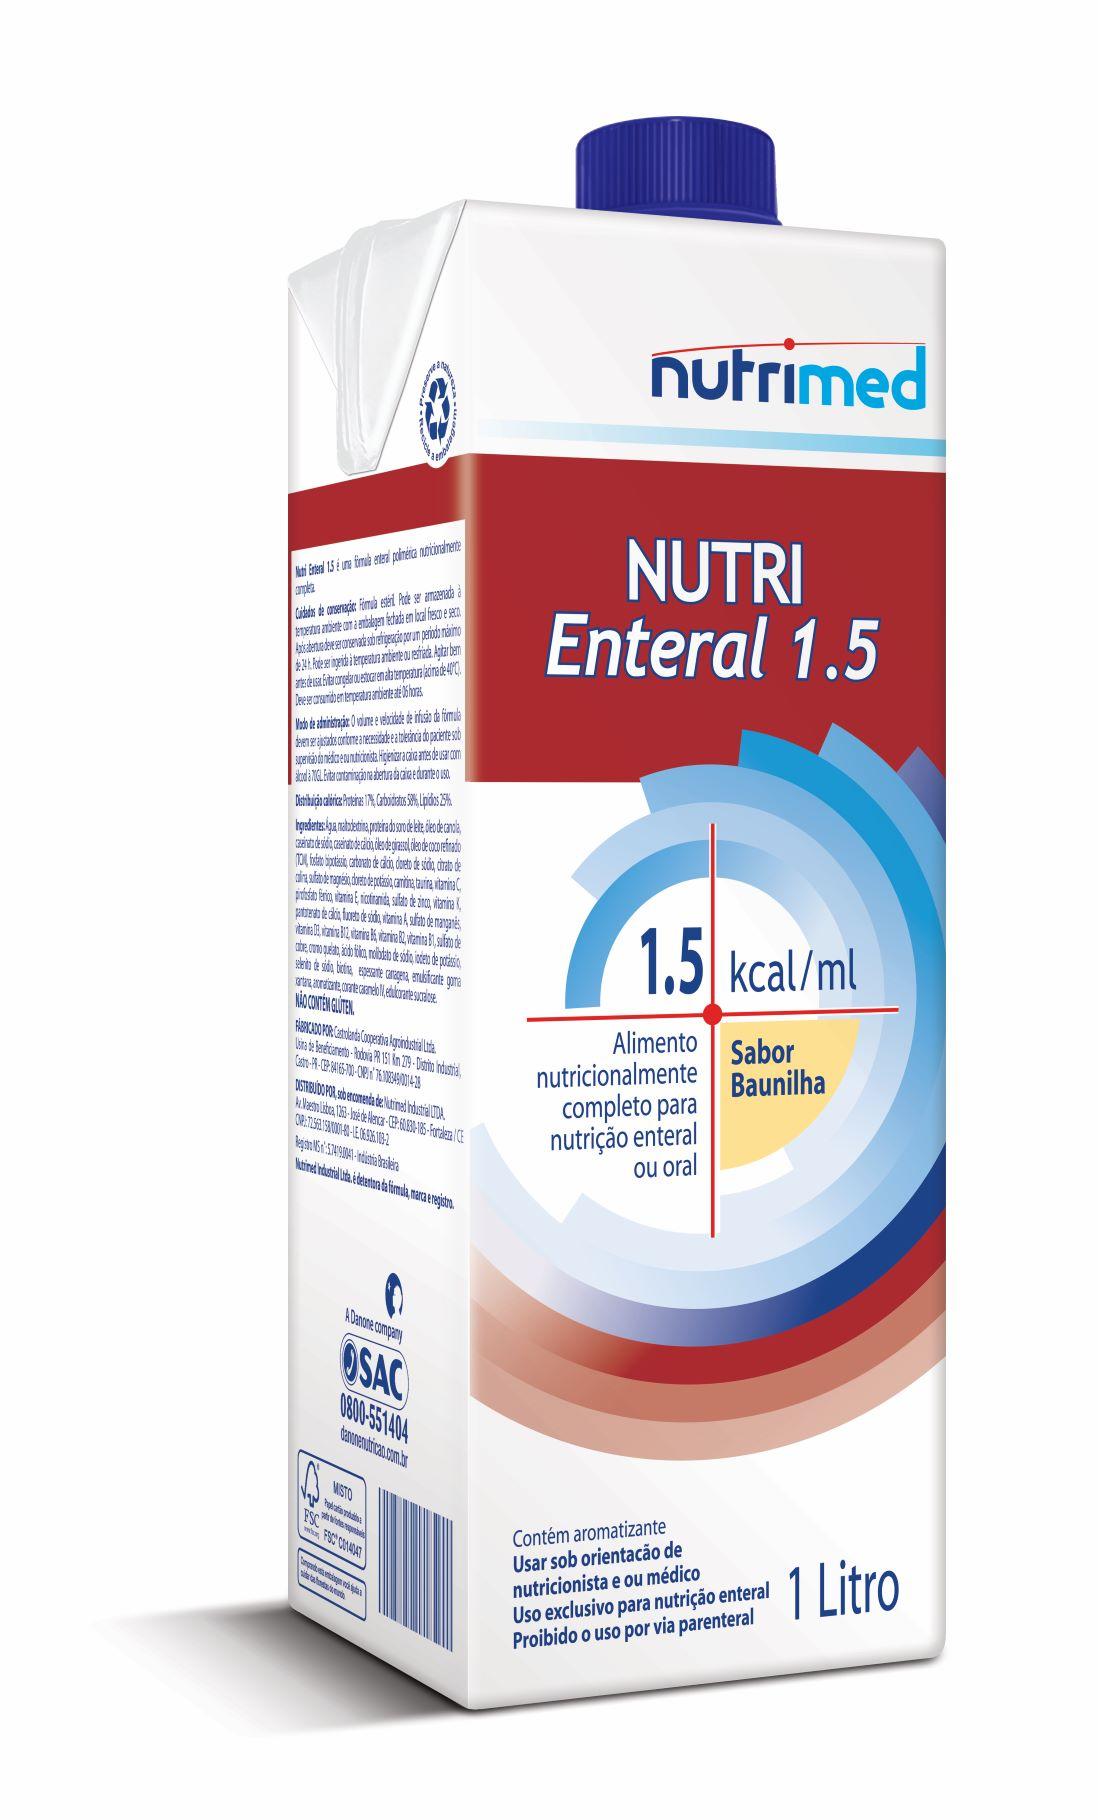 MOCKUP-NUTRI-1L-ENTERAL-1.5-2